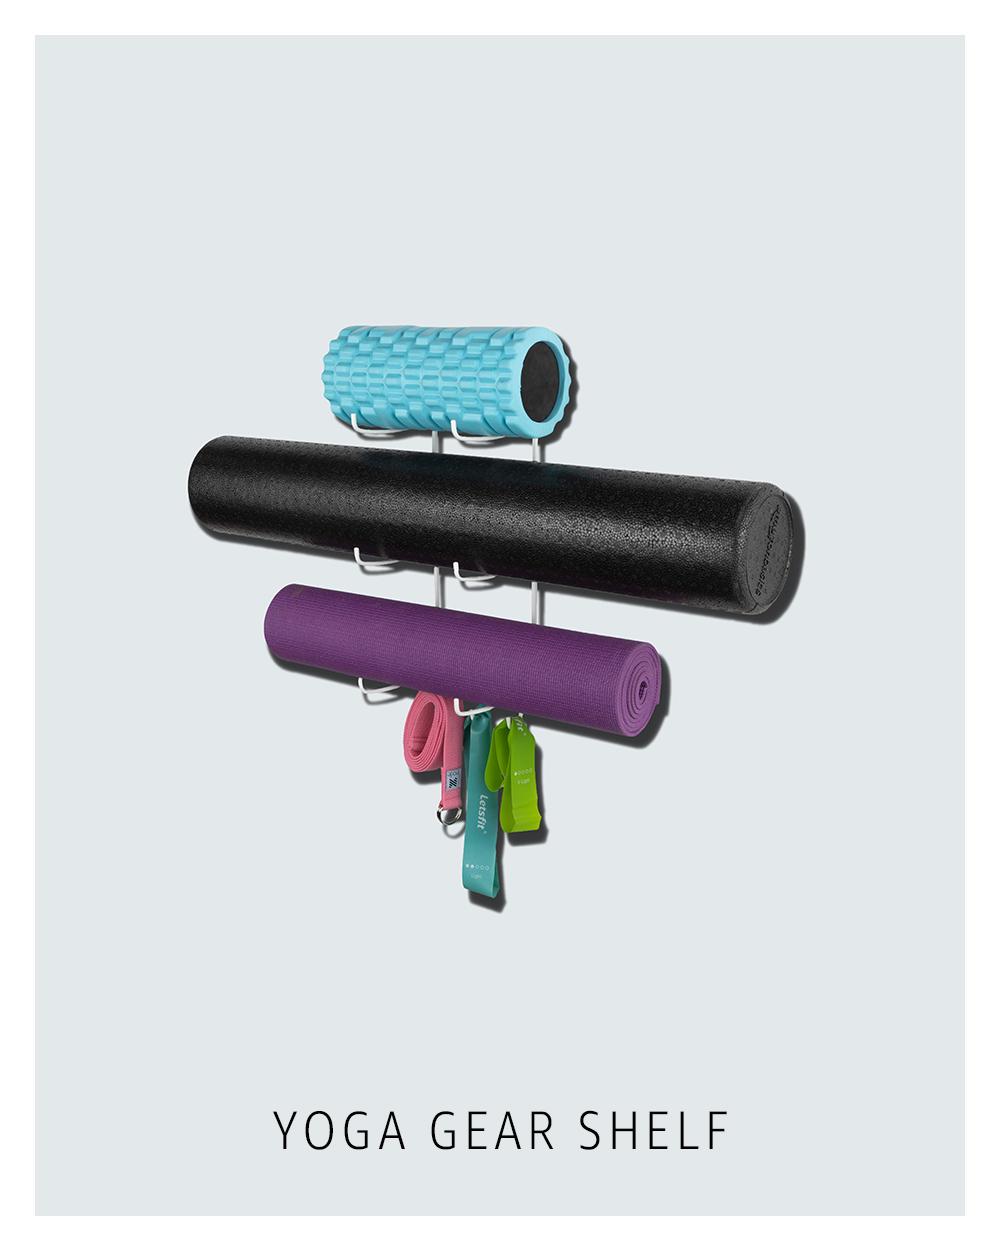 Yoga gear shelf